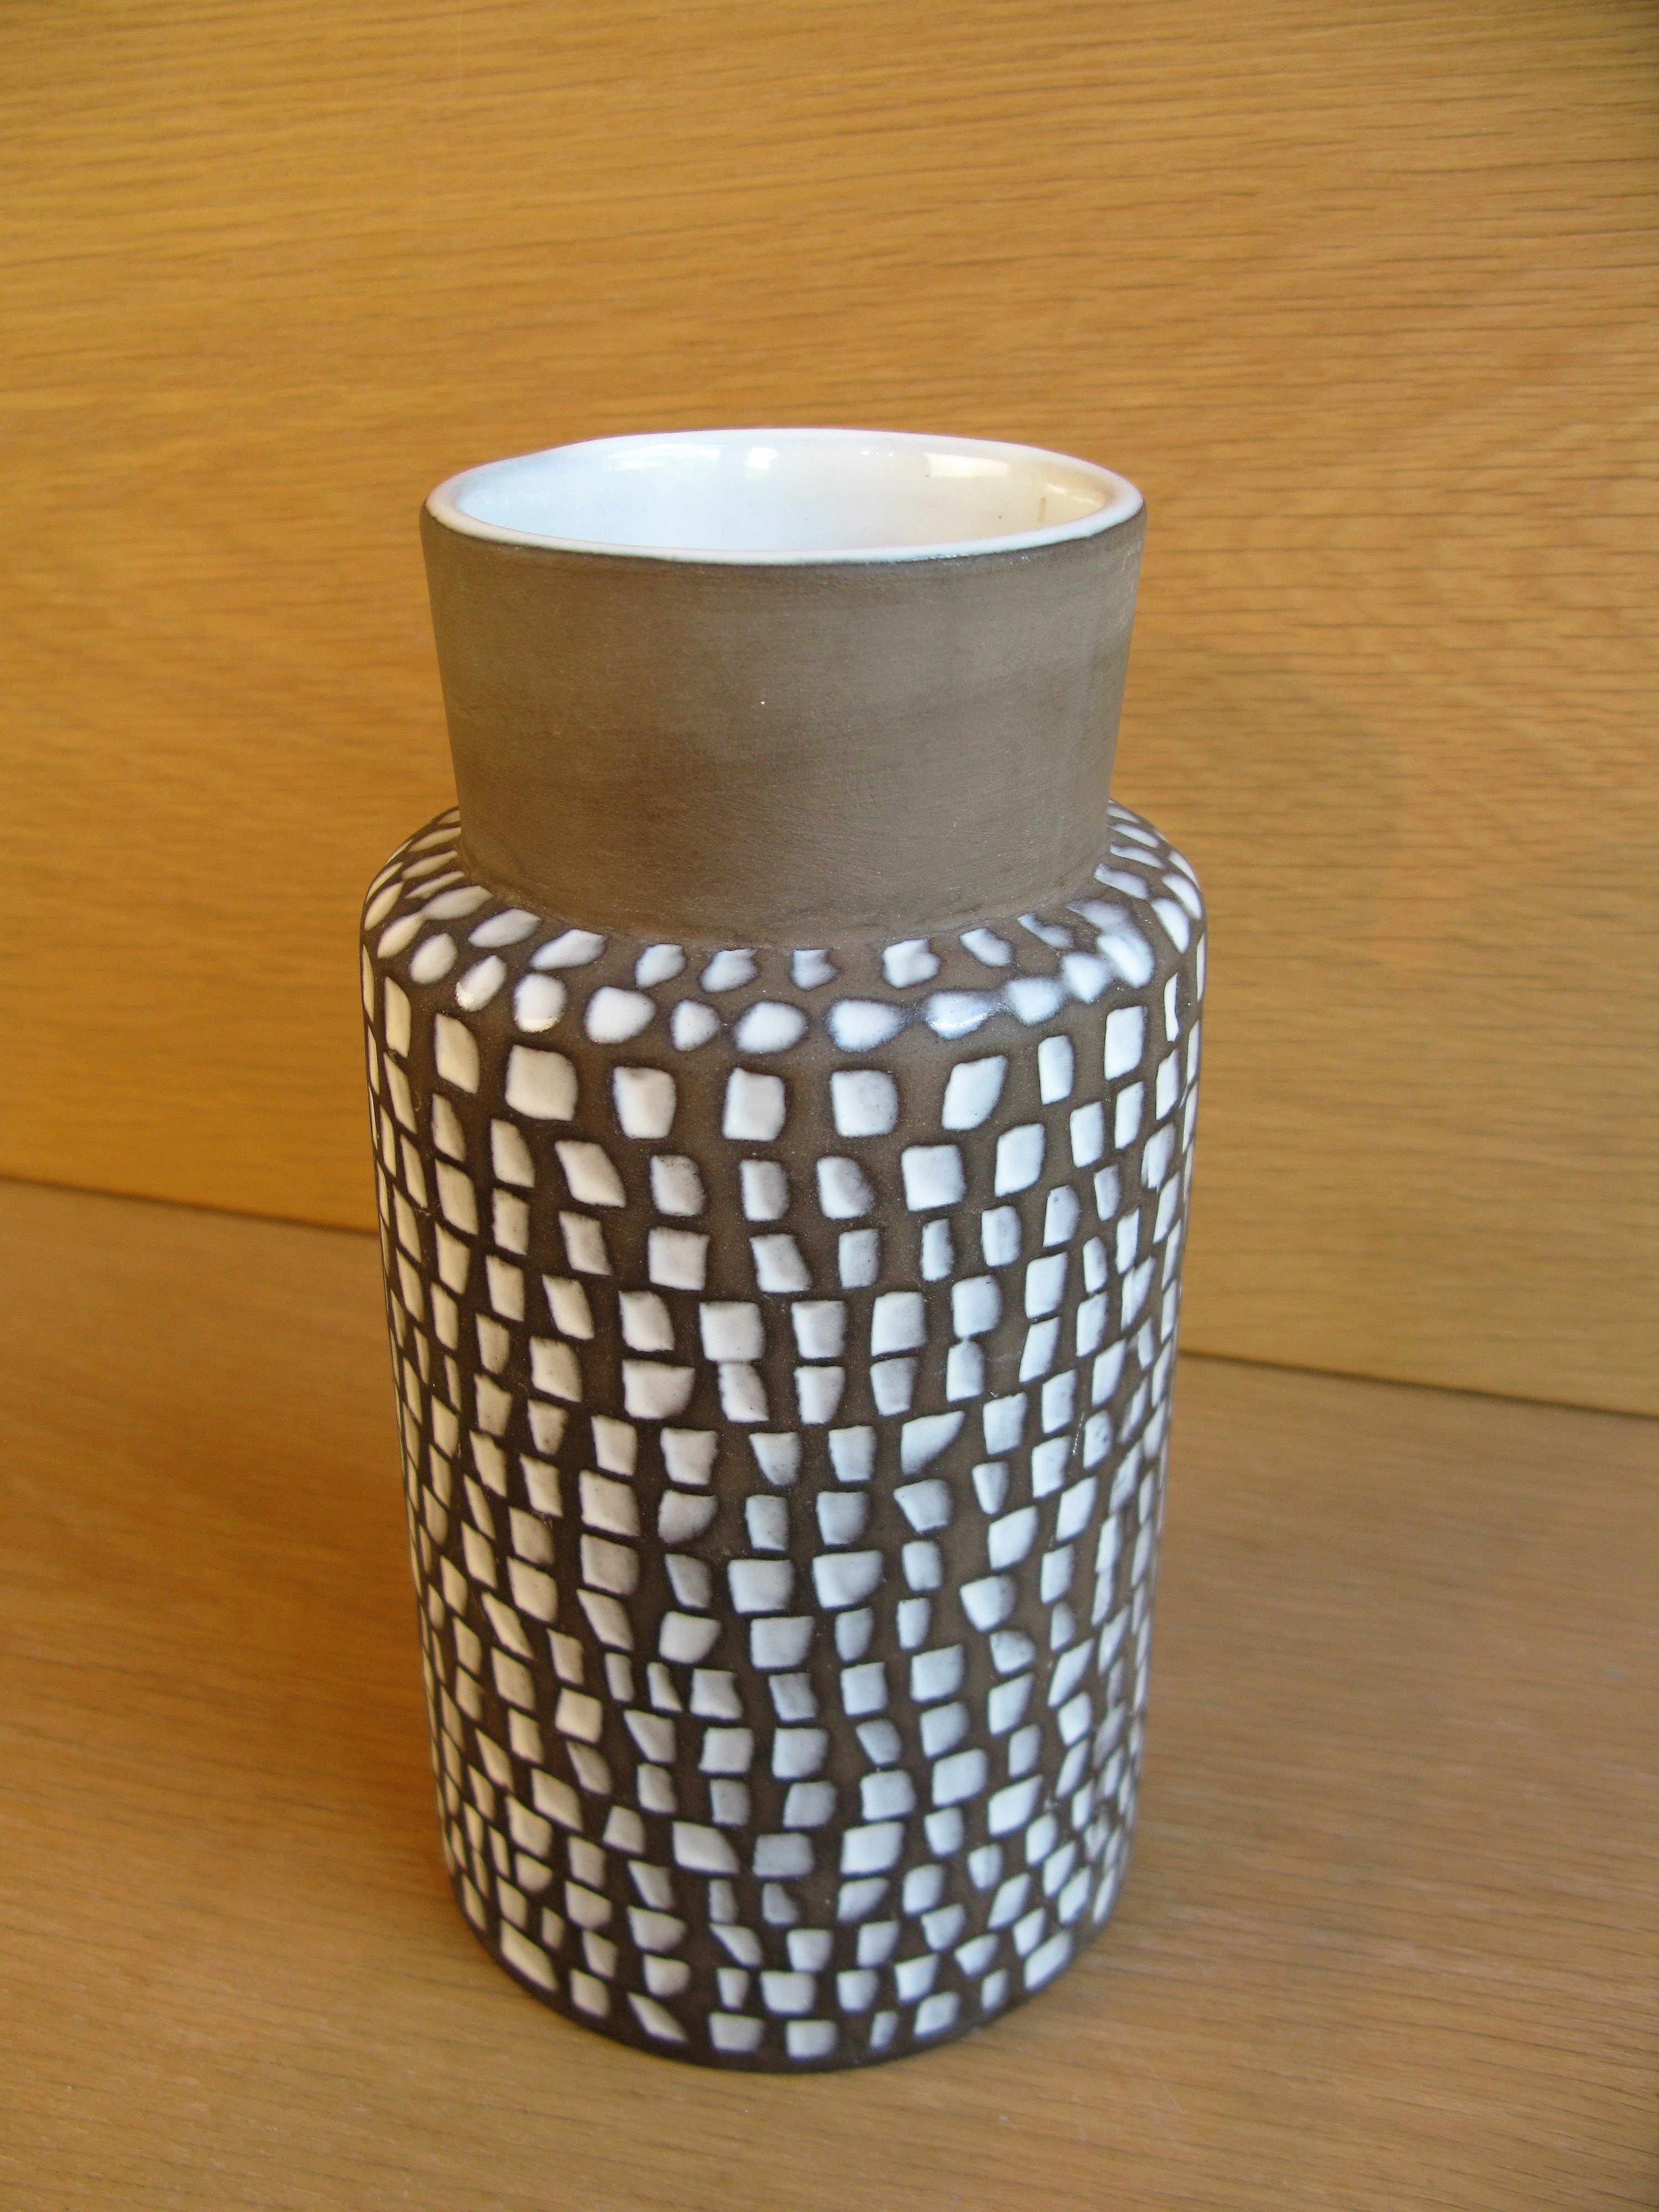 mosaic vase 43130/848 sold